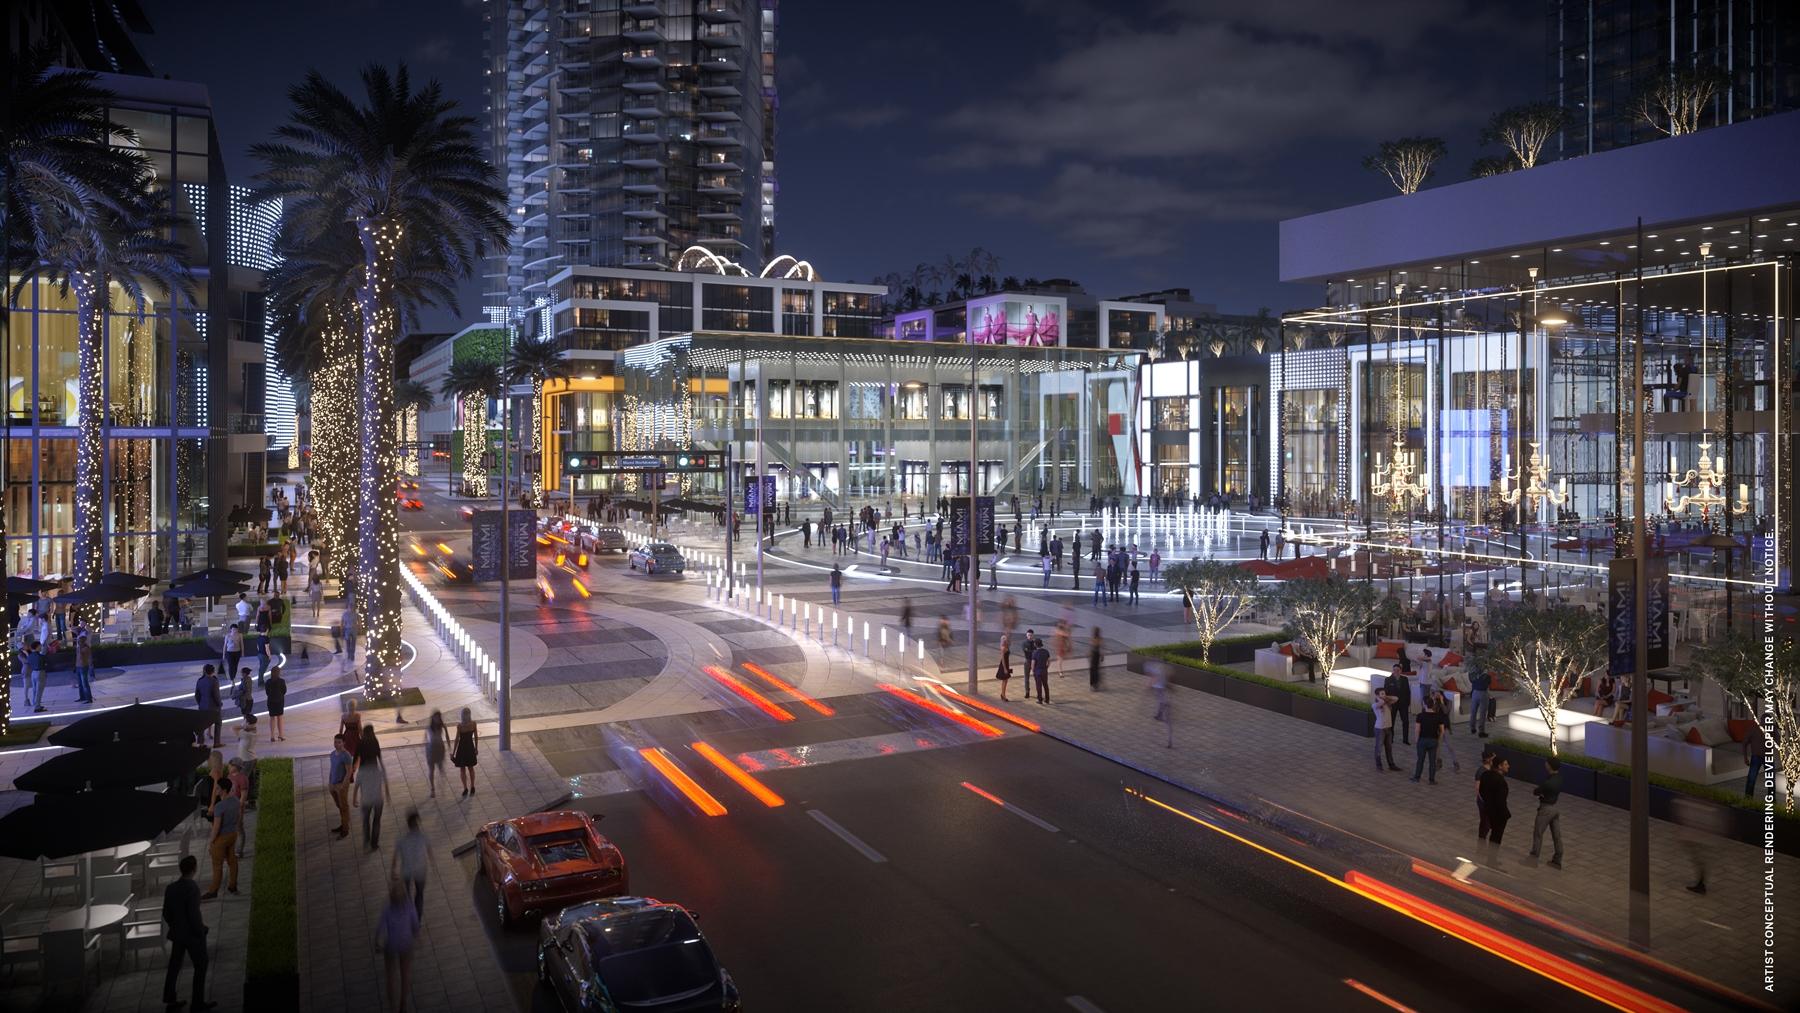 Miami_Worldcenter_Night_Plaza.0.jpg